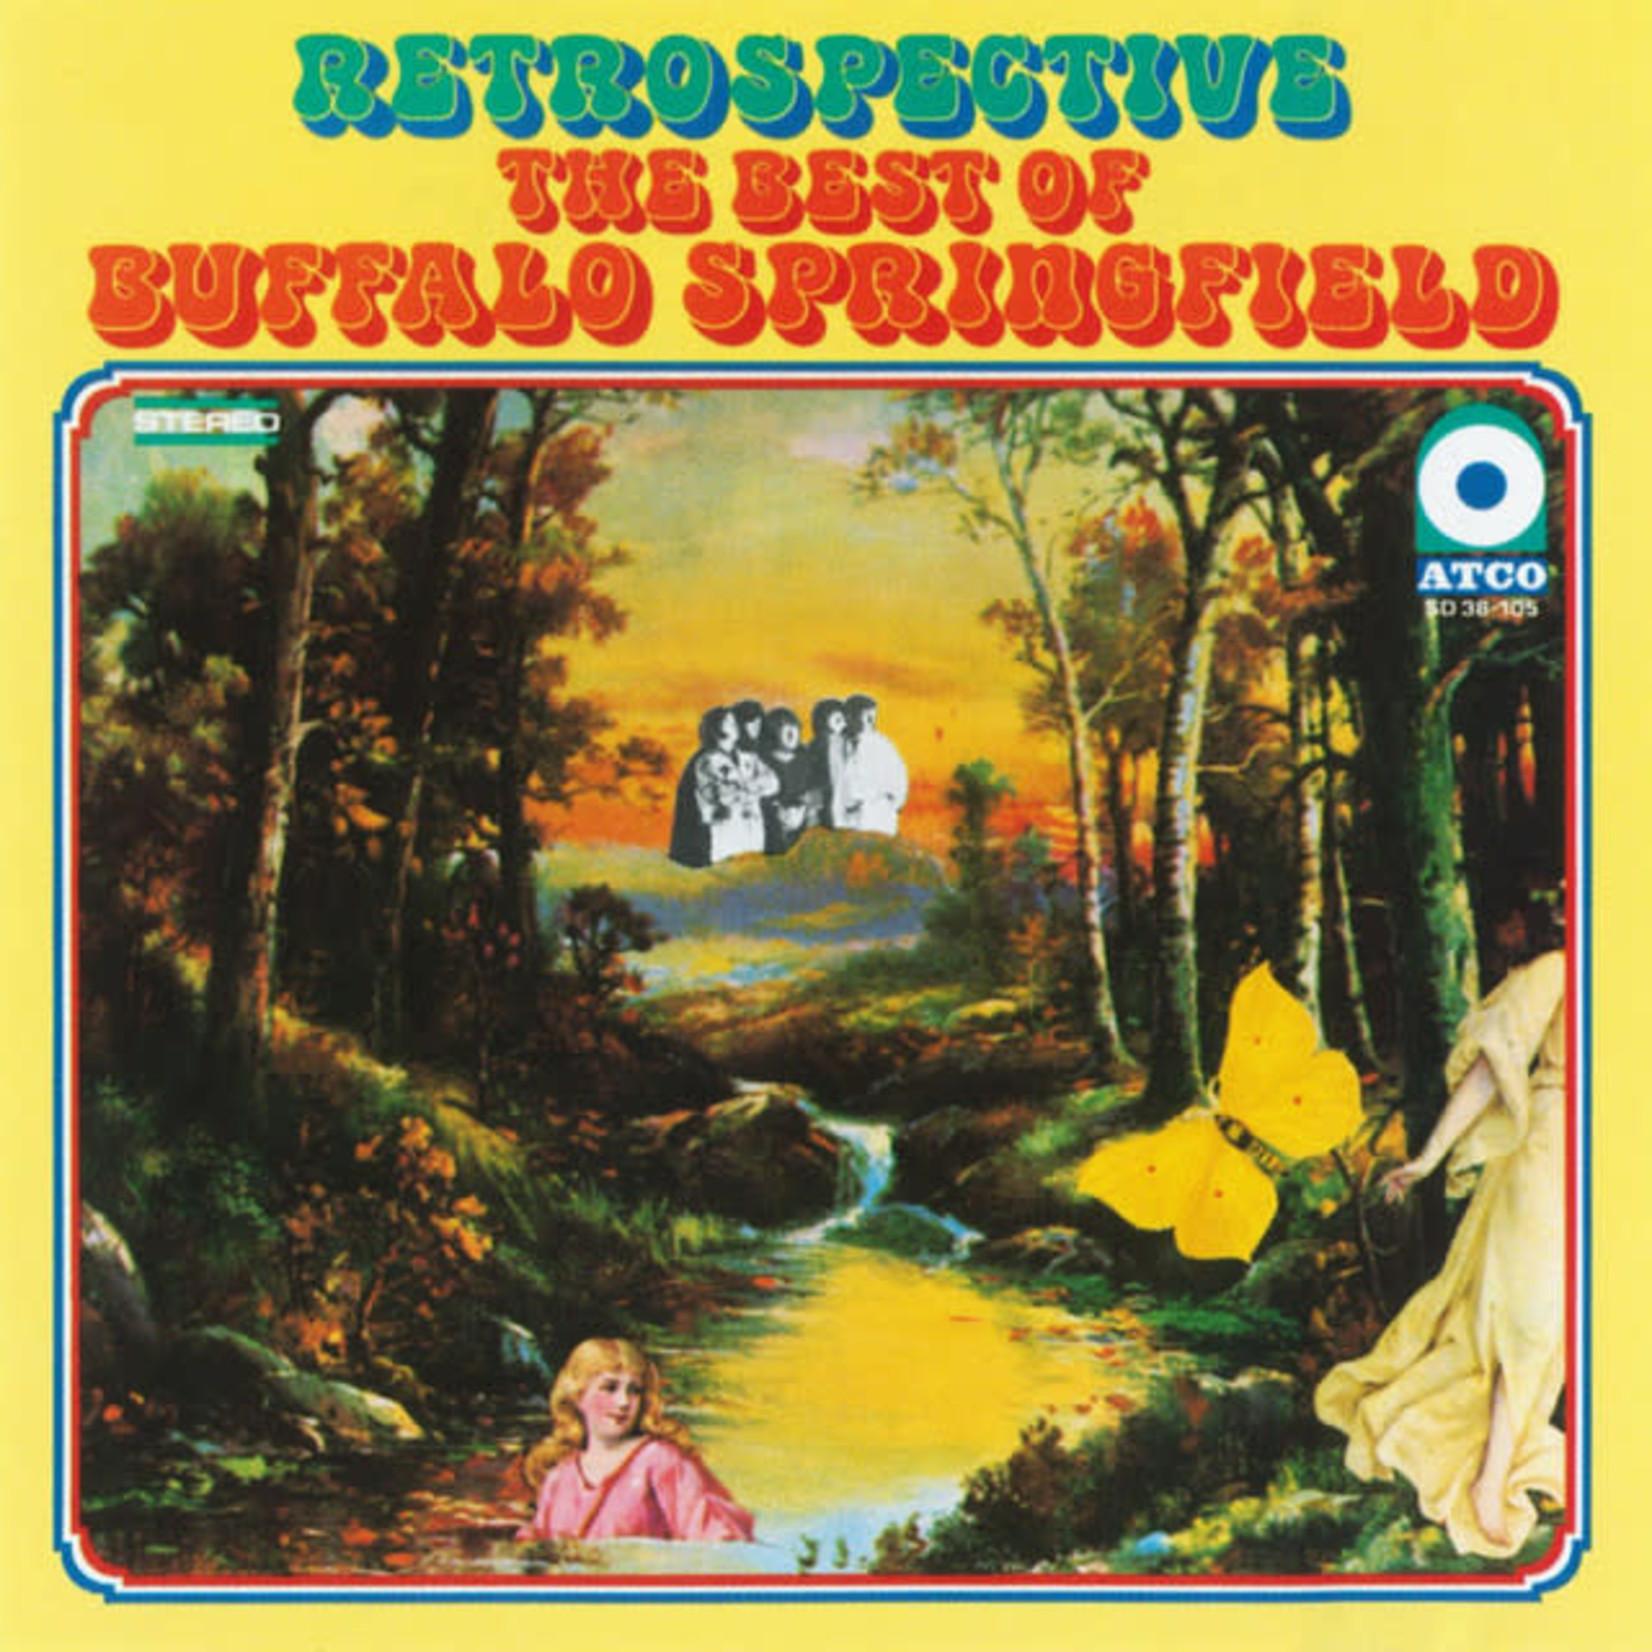 Vinyl Buffalo Springfield - Retrospective (Best Of)